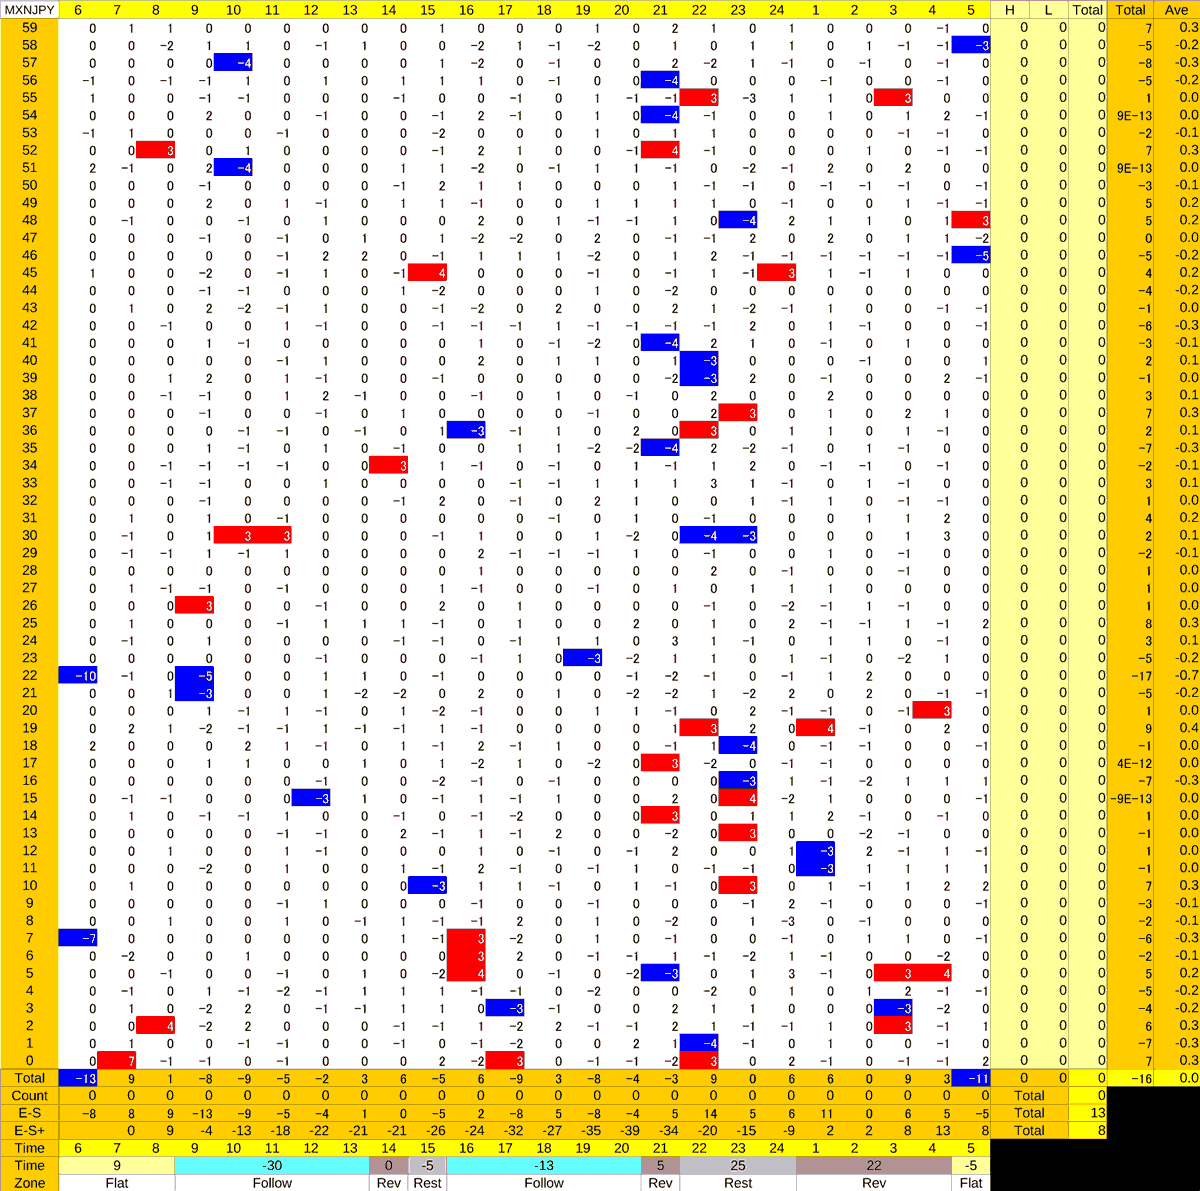 20200917_HS(3)MXNJPY